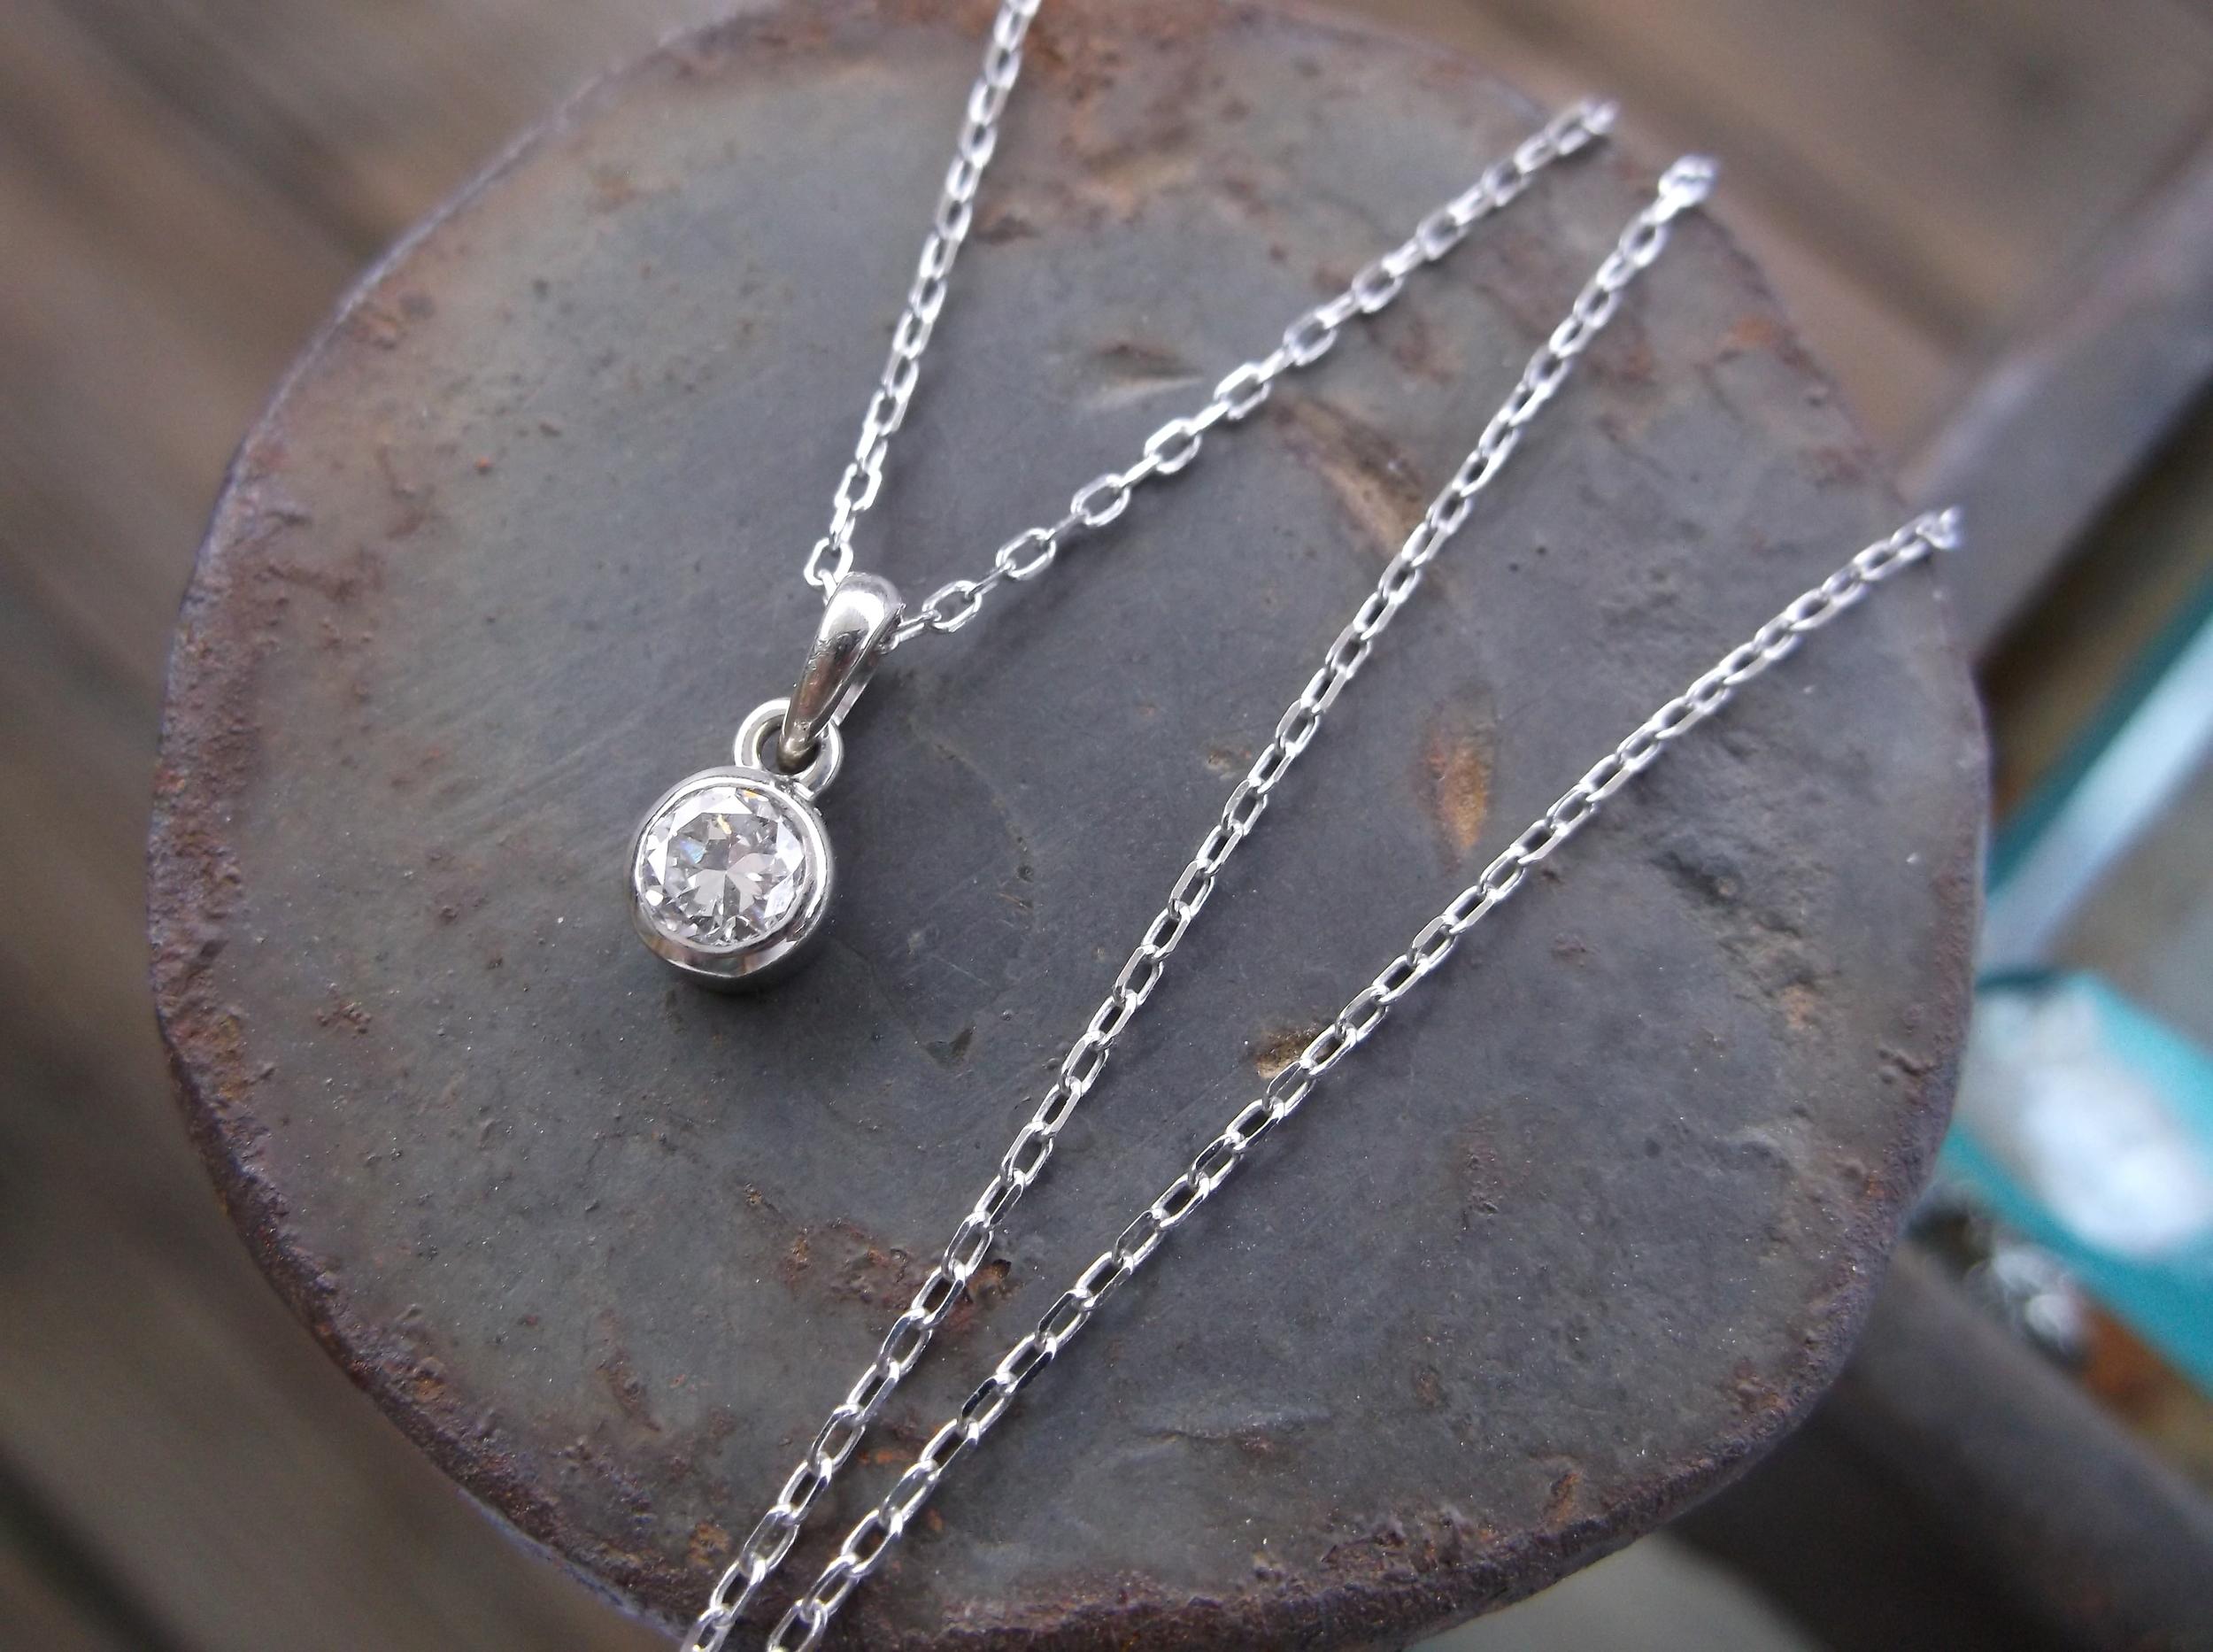 0.15 carat Old European cut diamond bezel set pendant in 14K white gold.